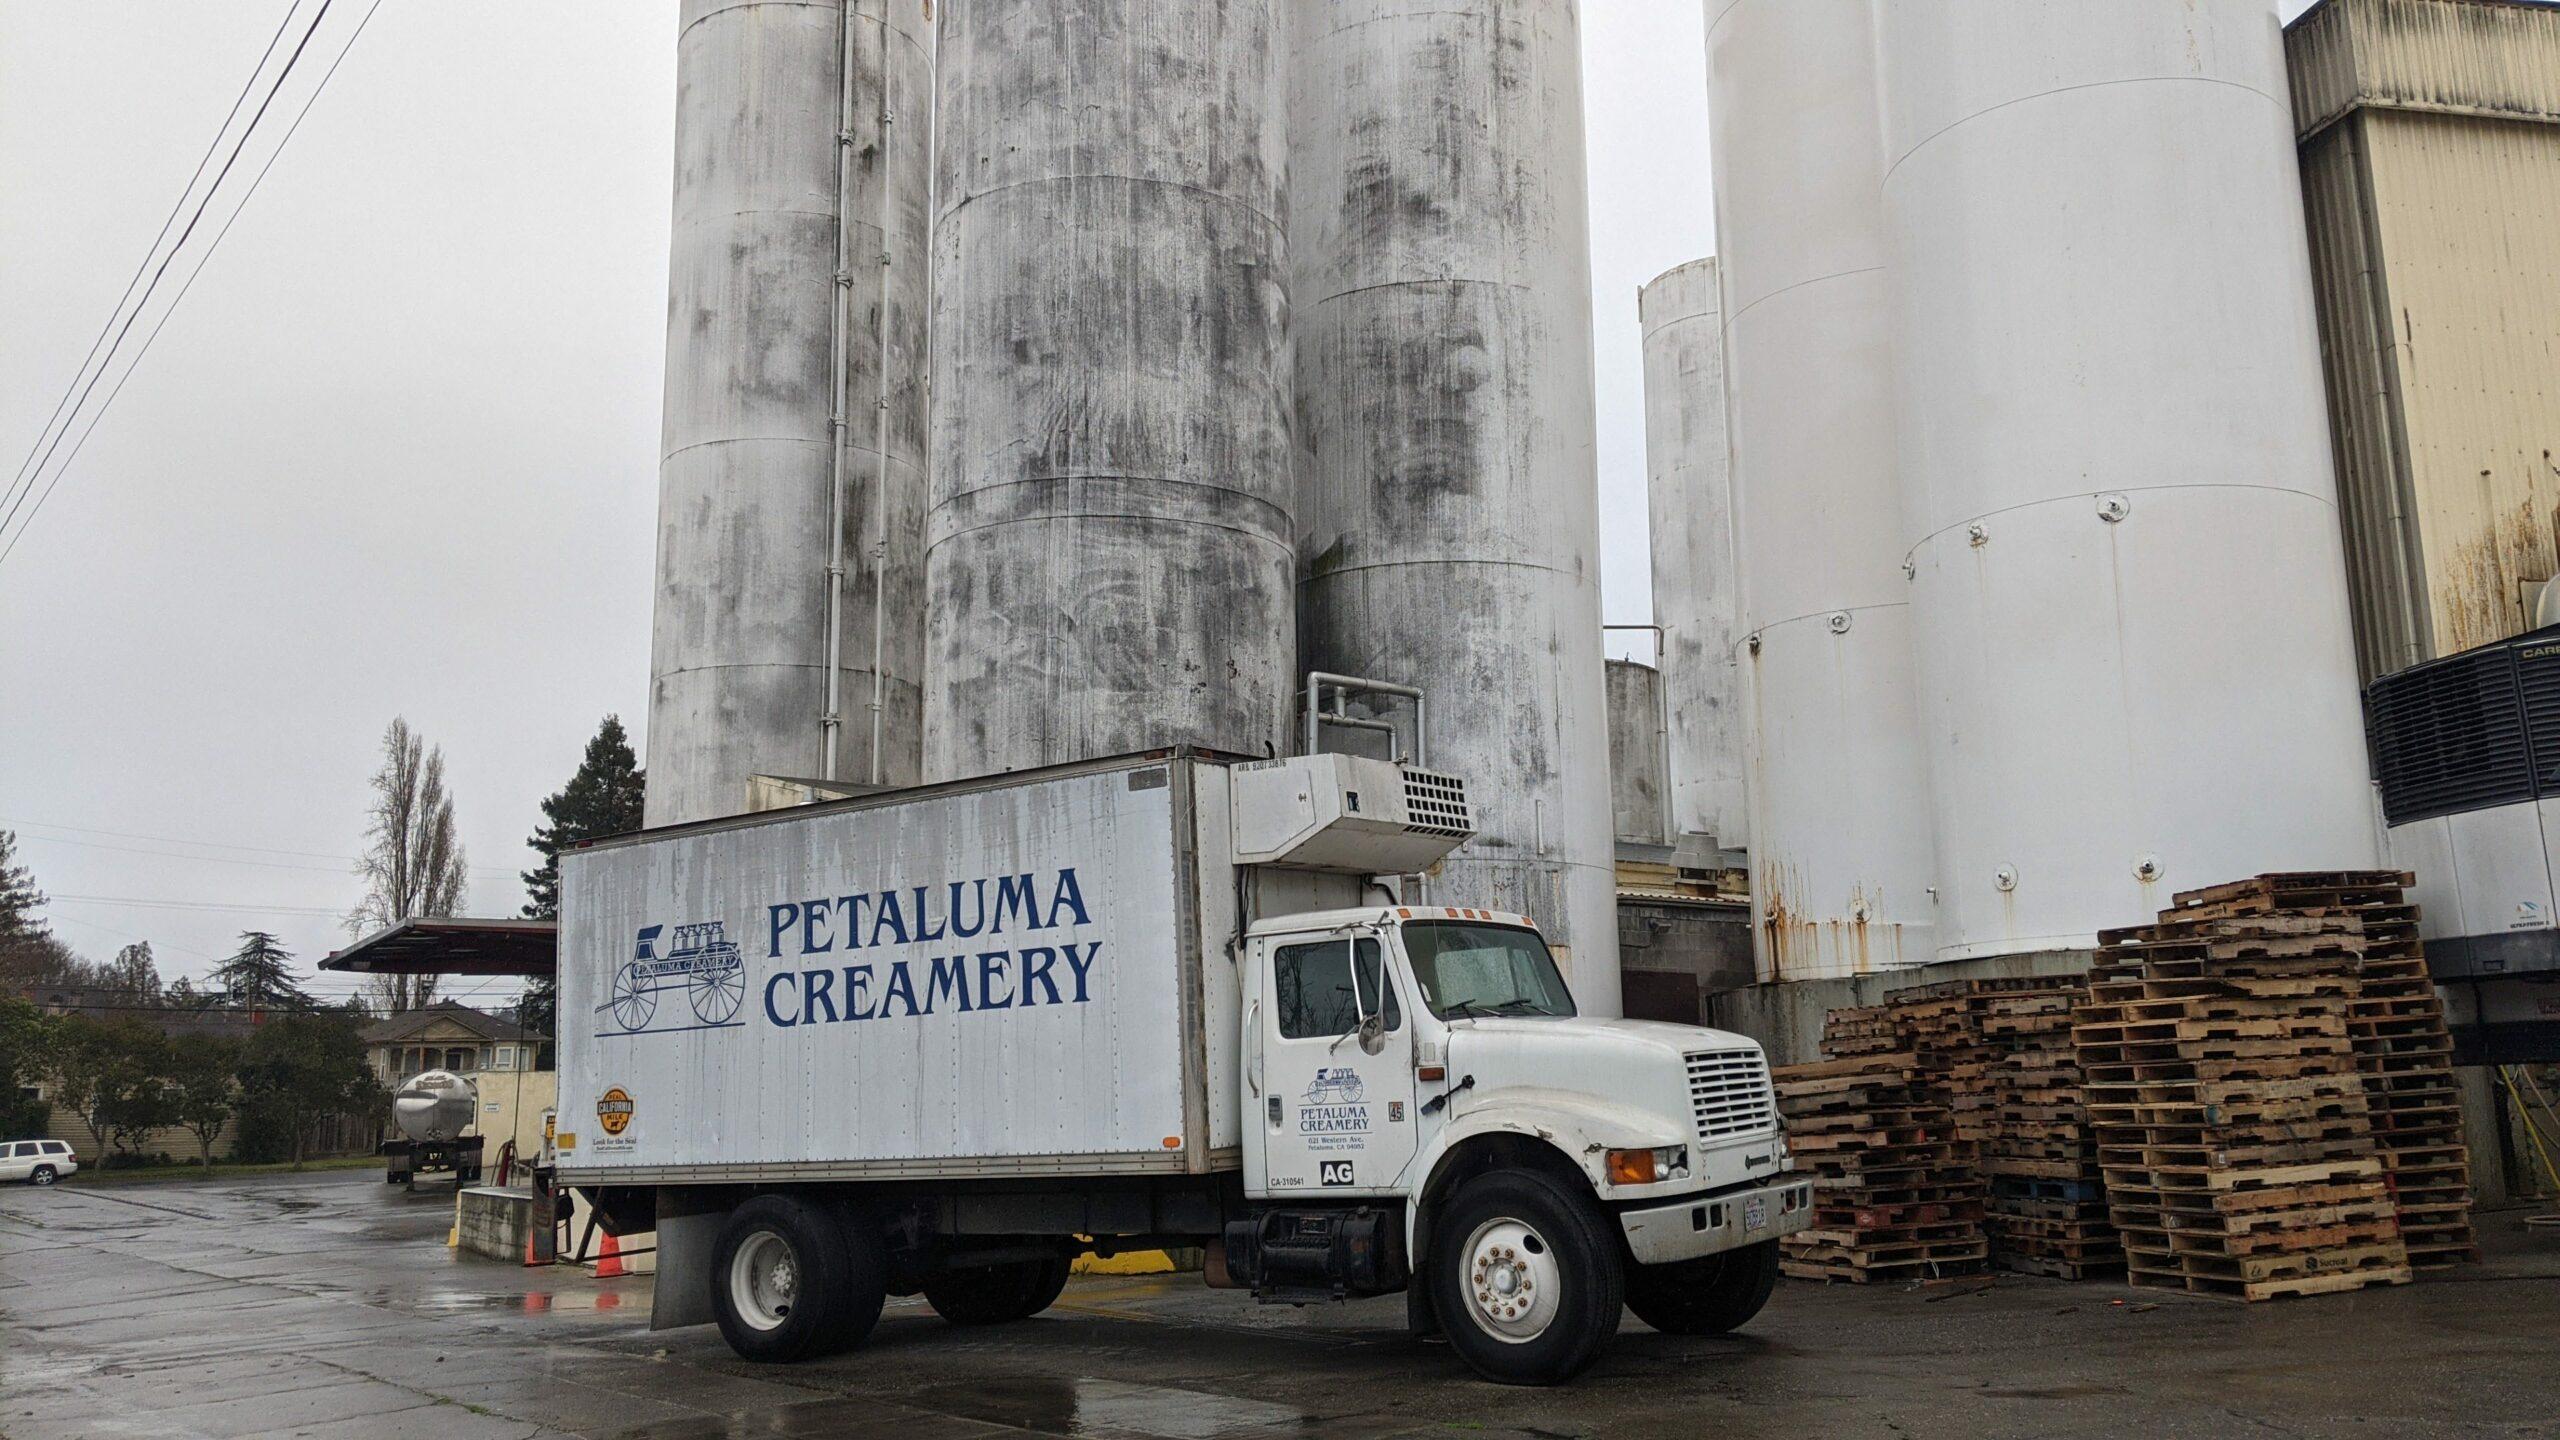 Petaluma Creamery Sonoma County Daedalus Howell